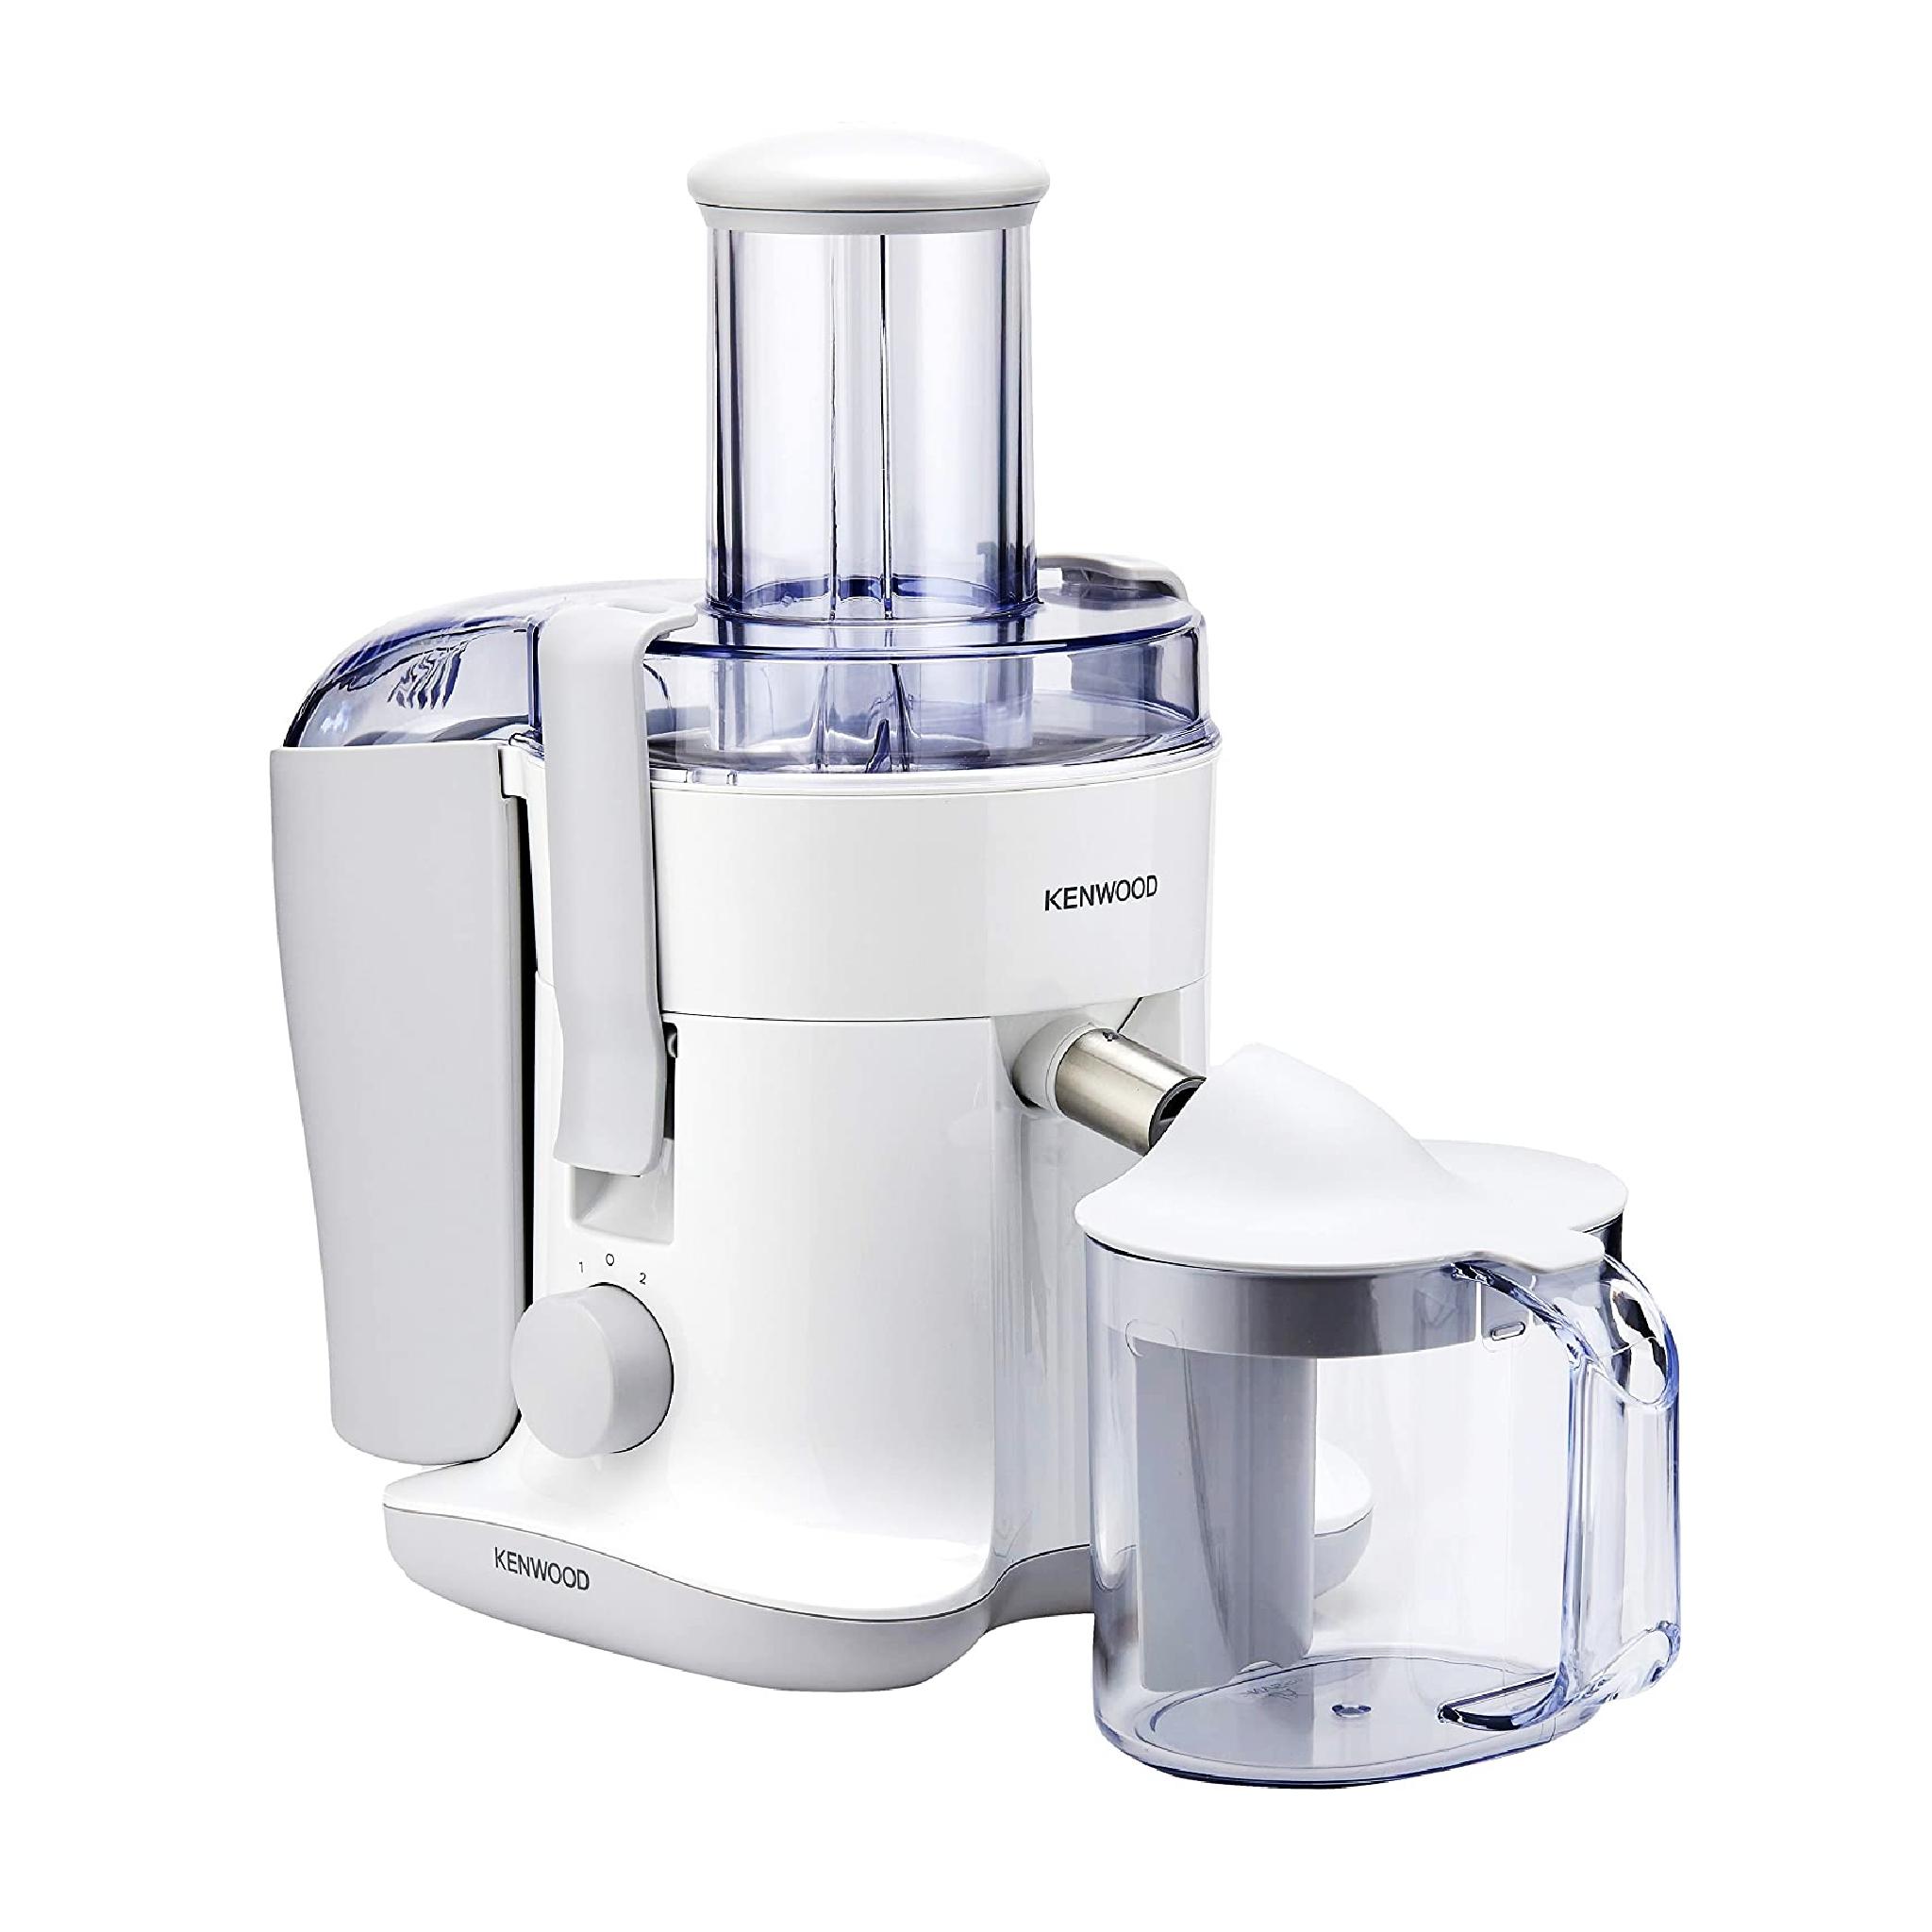 Kenwood Centrifugal Juicer - a cheap juicer